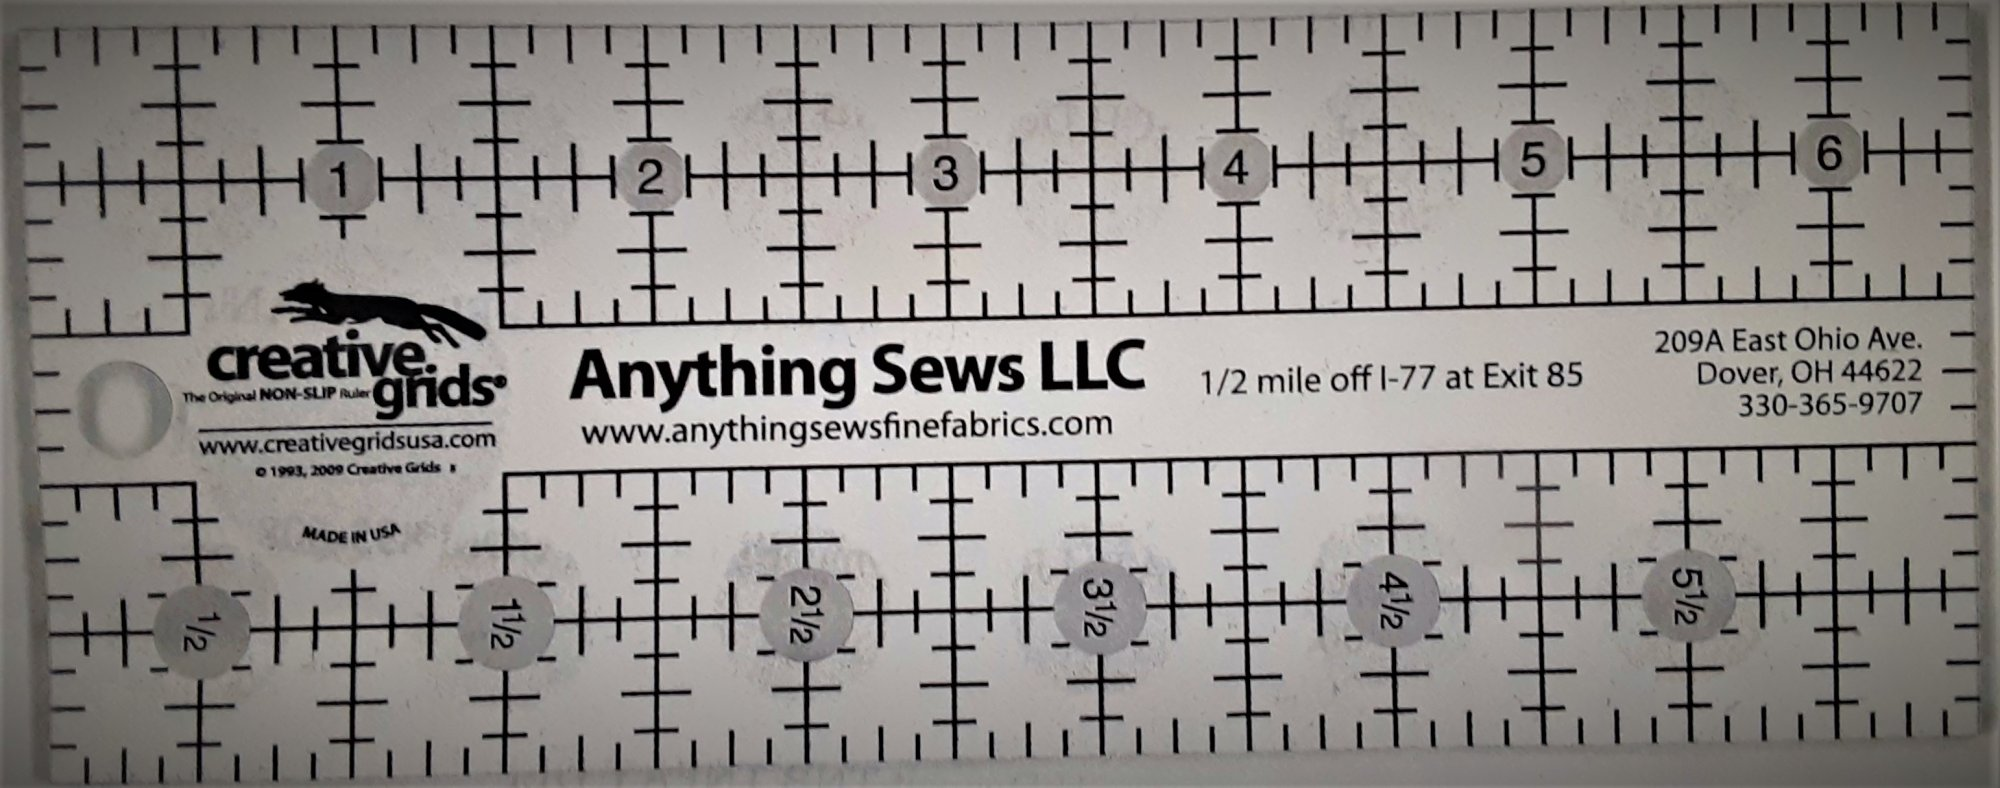 071920211 Anything Sews 2 1/2x6 1/2 CGR ruler